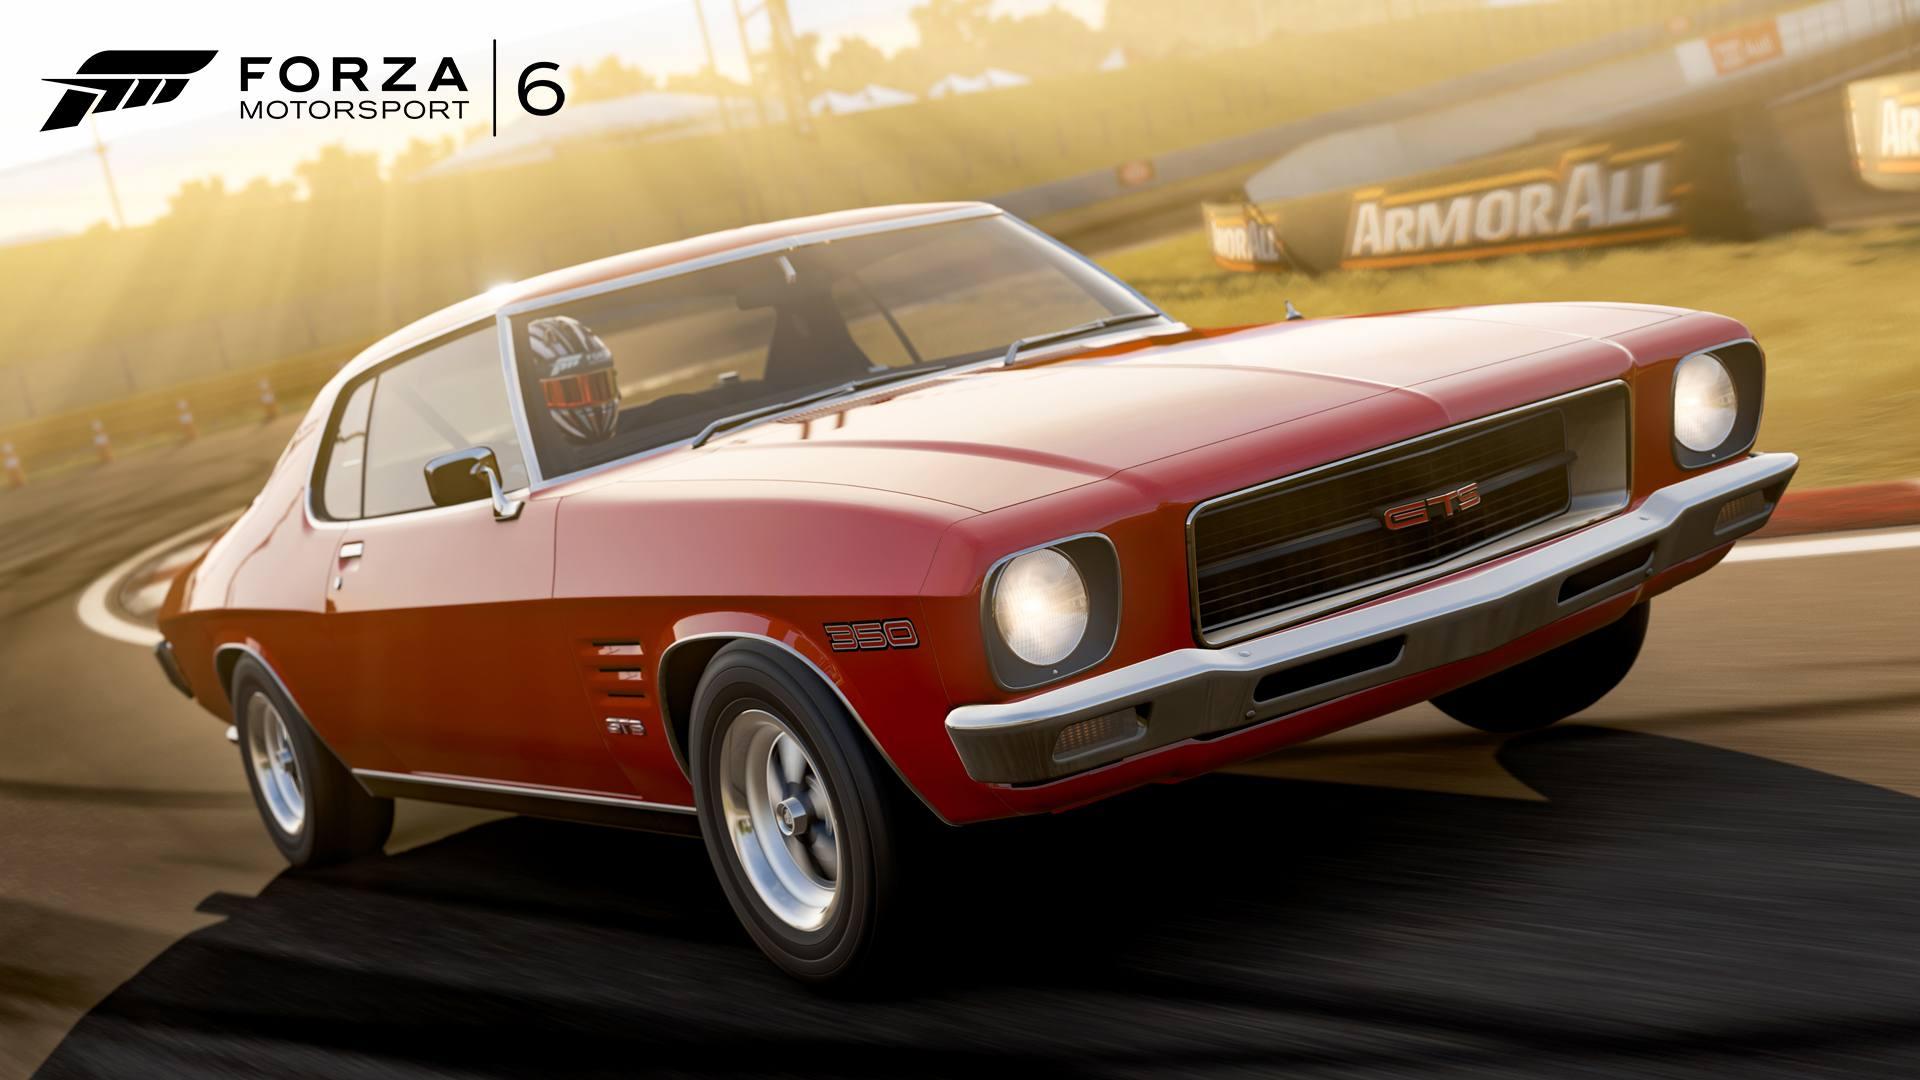 Forza Motorsport 6 05-01-16 1973 Holden HQ Monaro GTS 350